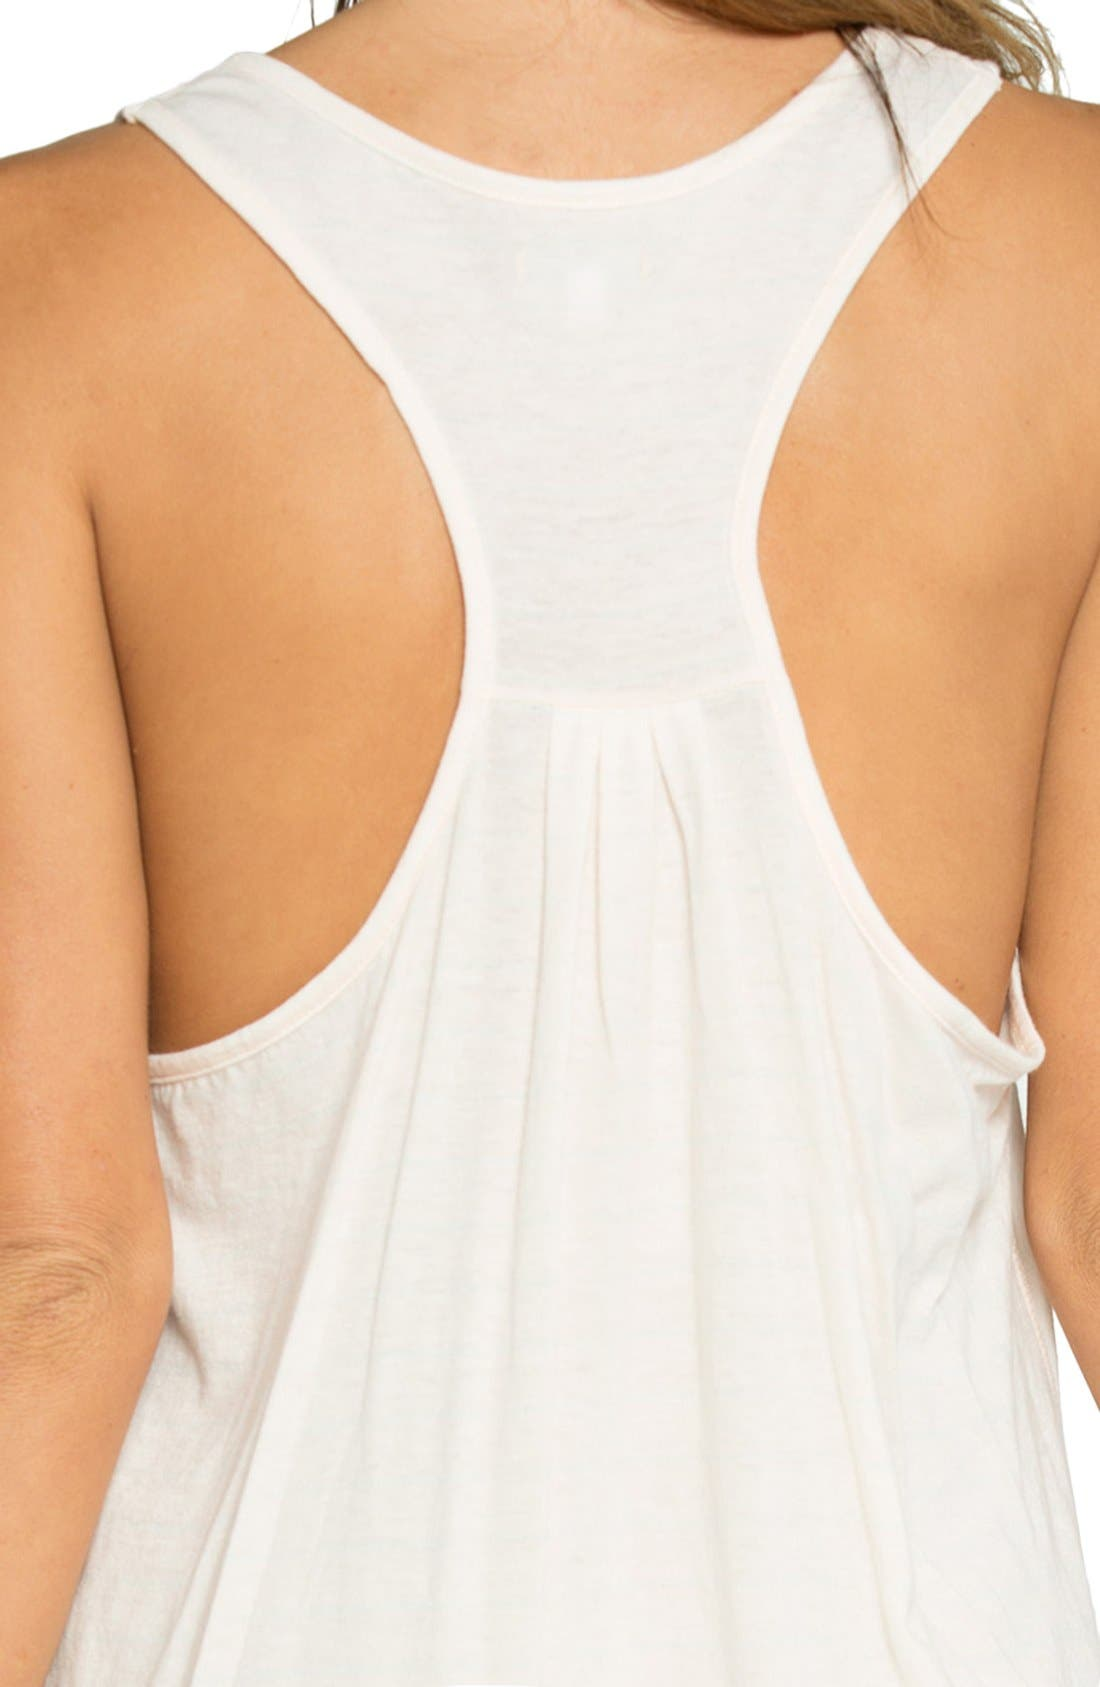 Alternate Image 3  - TAVIK 'Mila' Knit Racerback Dress